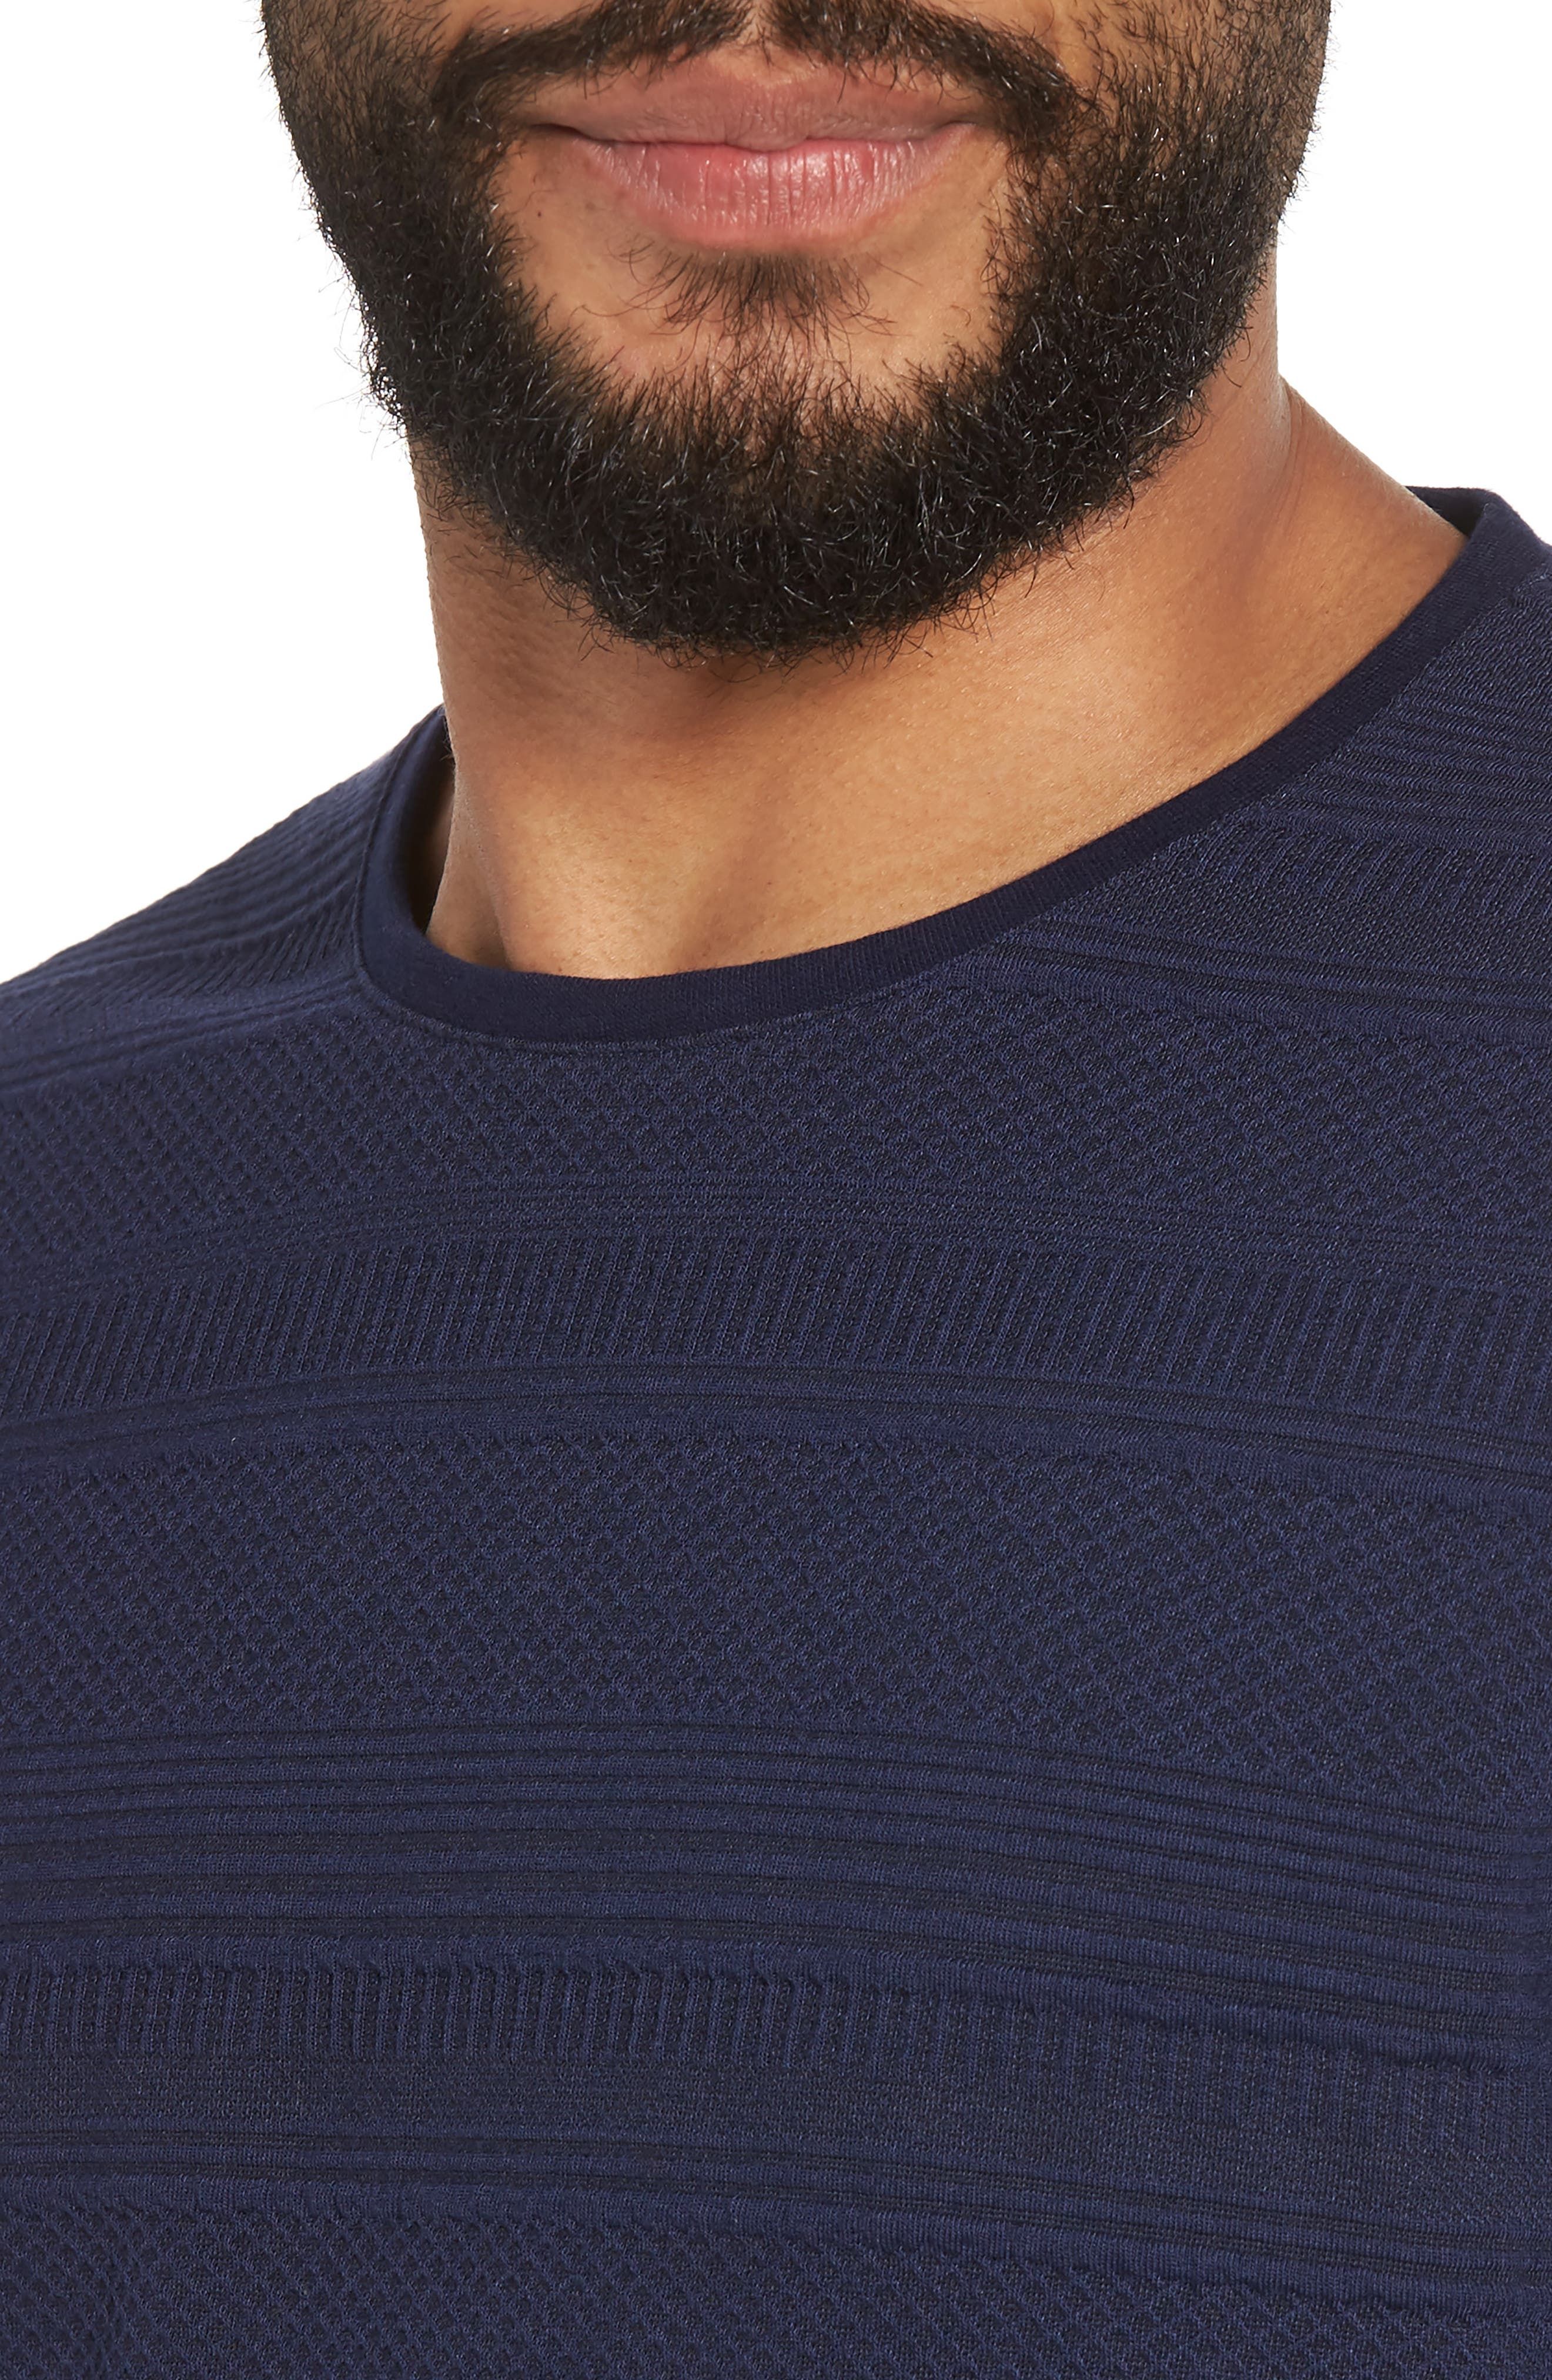 Banded Cuff Crewneck T-Shirt,                             Alternate thumbnail 4, color,                             Navy/Black